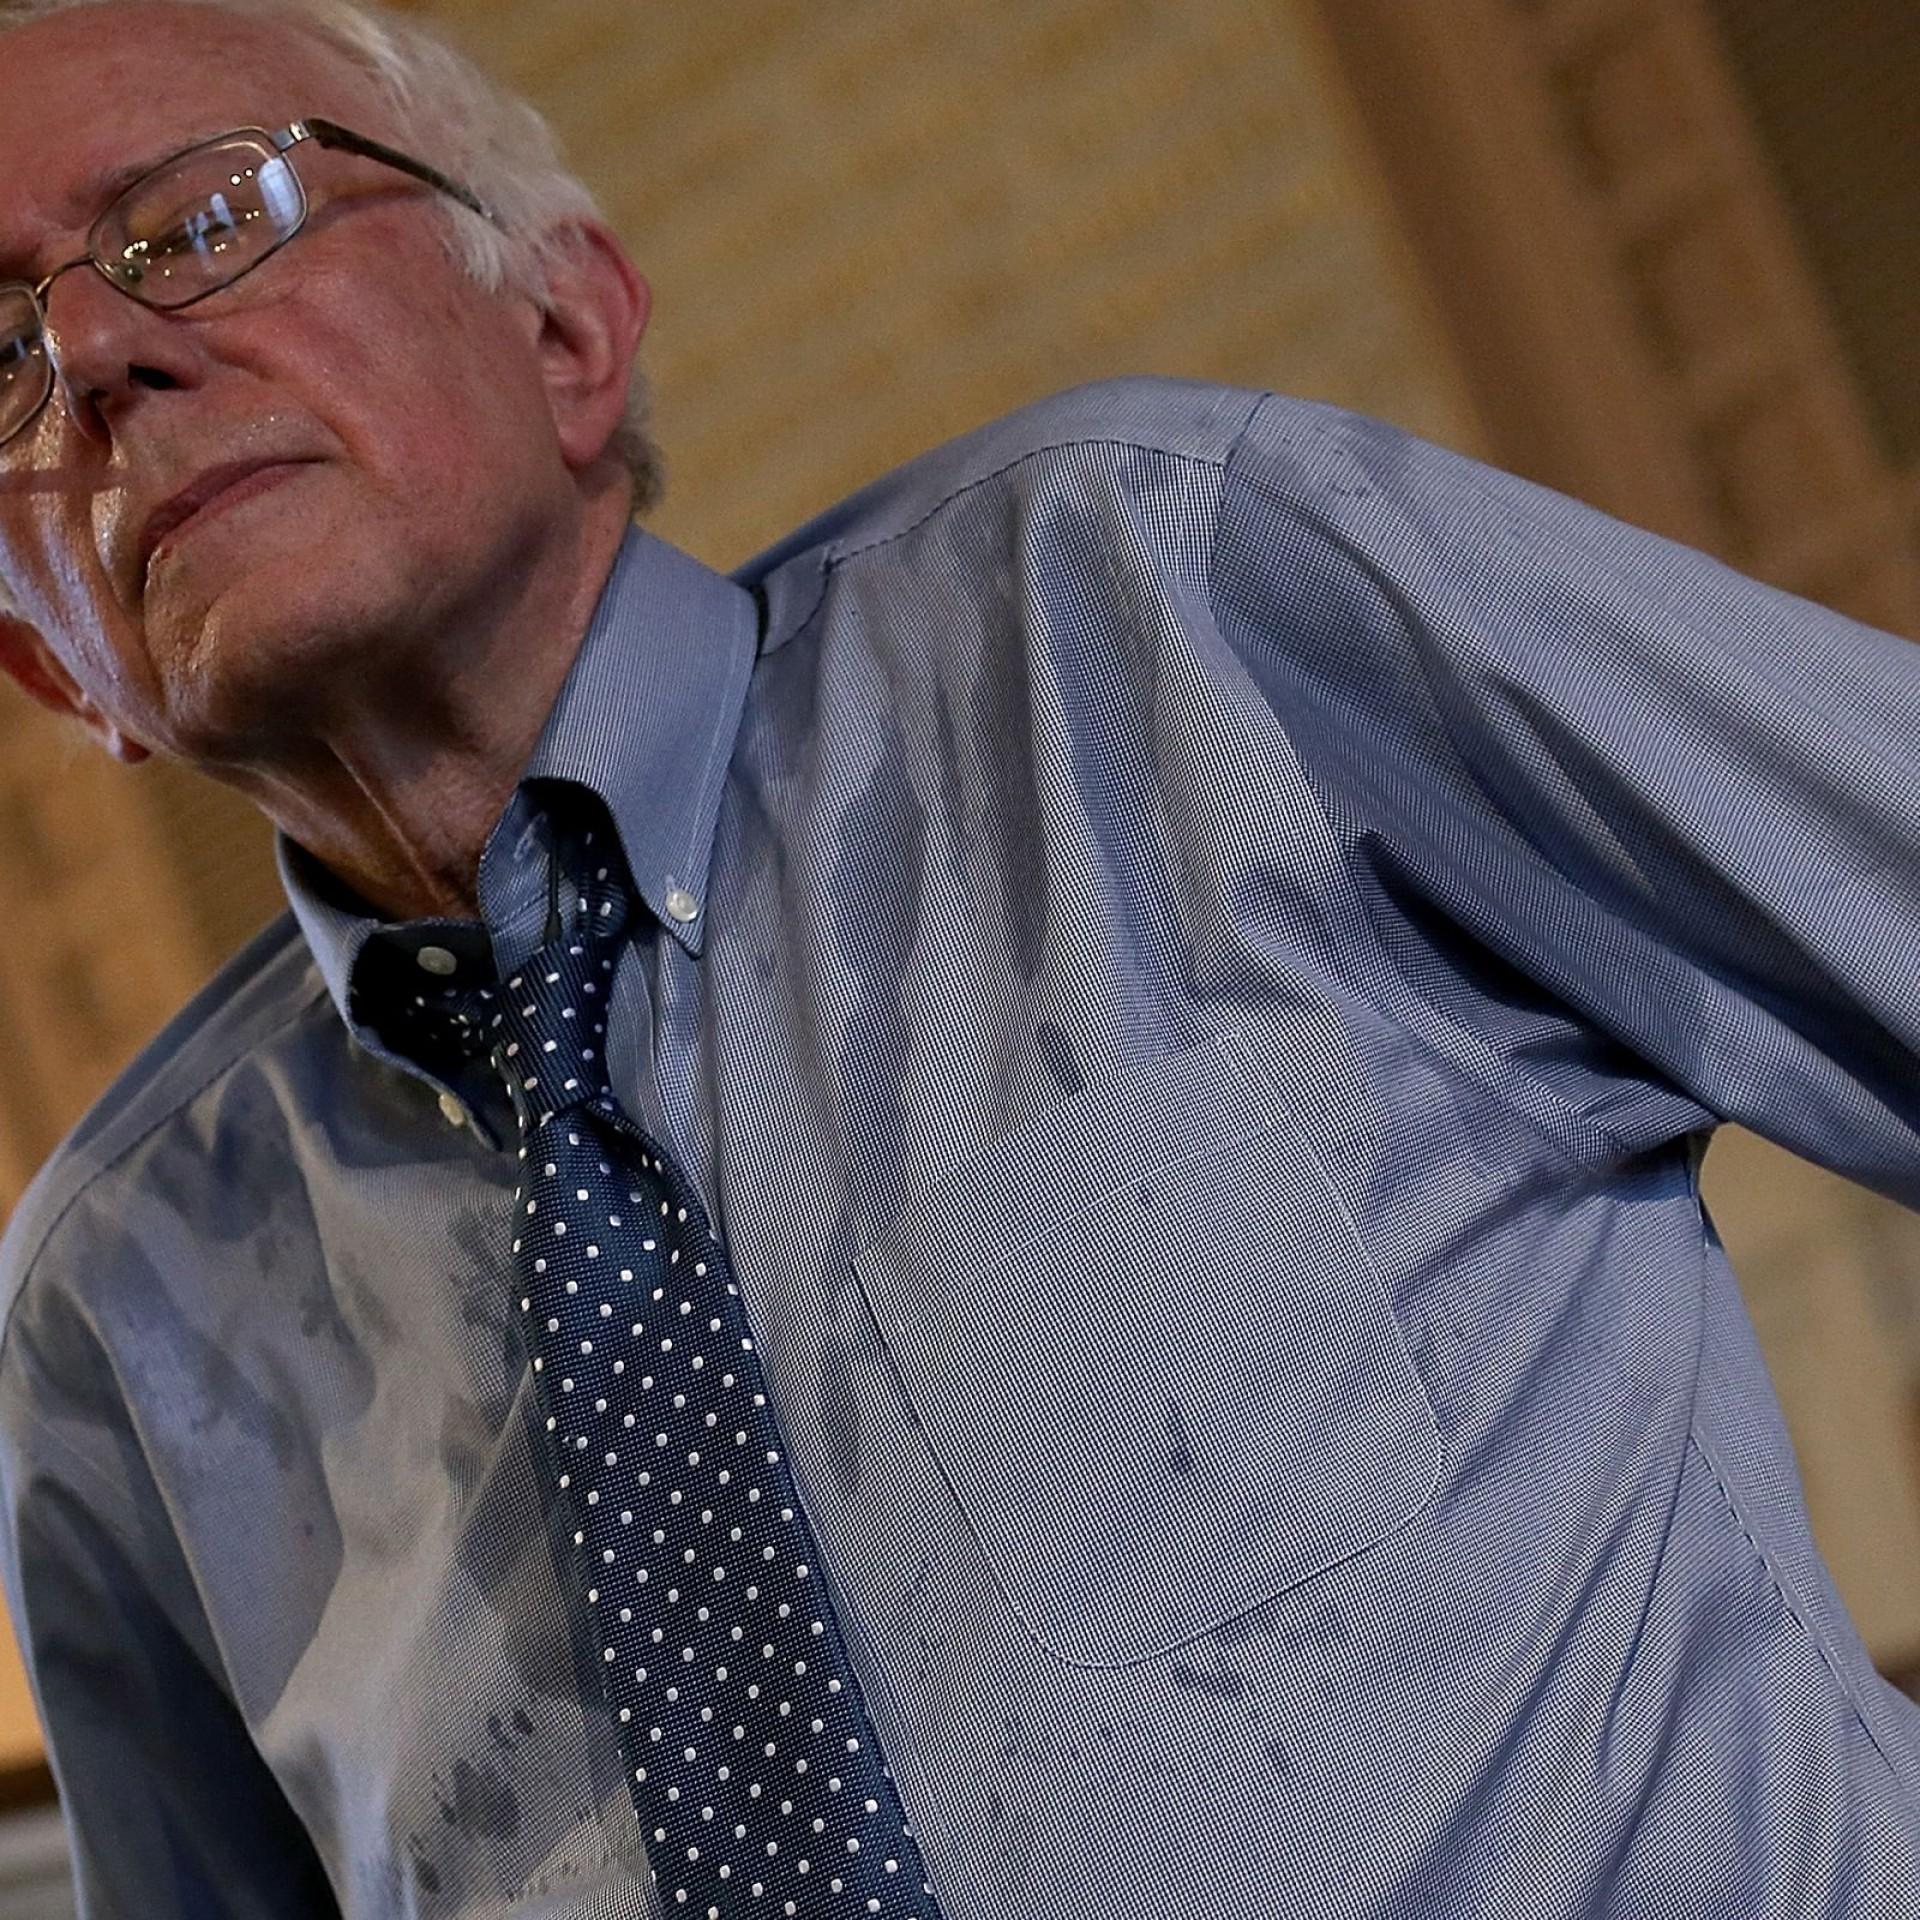 019 Mthiyzgymtbhyimvyvlec0r2znftukxsm193mkk2c3hbs3banlpfps83odn4mty1ojiymtd4mtu5os8xnjawede2mdavzmlsdgvyczpmb3jtyxqoanblzyk6cxvhbgl0esg4mckvahr0chm6ly9zmy5hbwf6b25hd3muy29tl3bvbgljew1pyy1pbwfnzxmvnxntehgx Phenomenal Bernie Sanders Rape Essay 1920